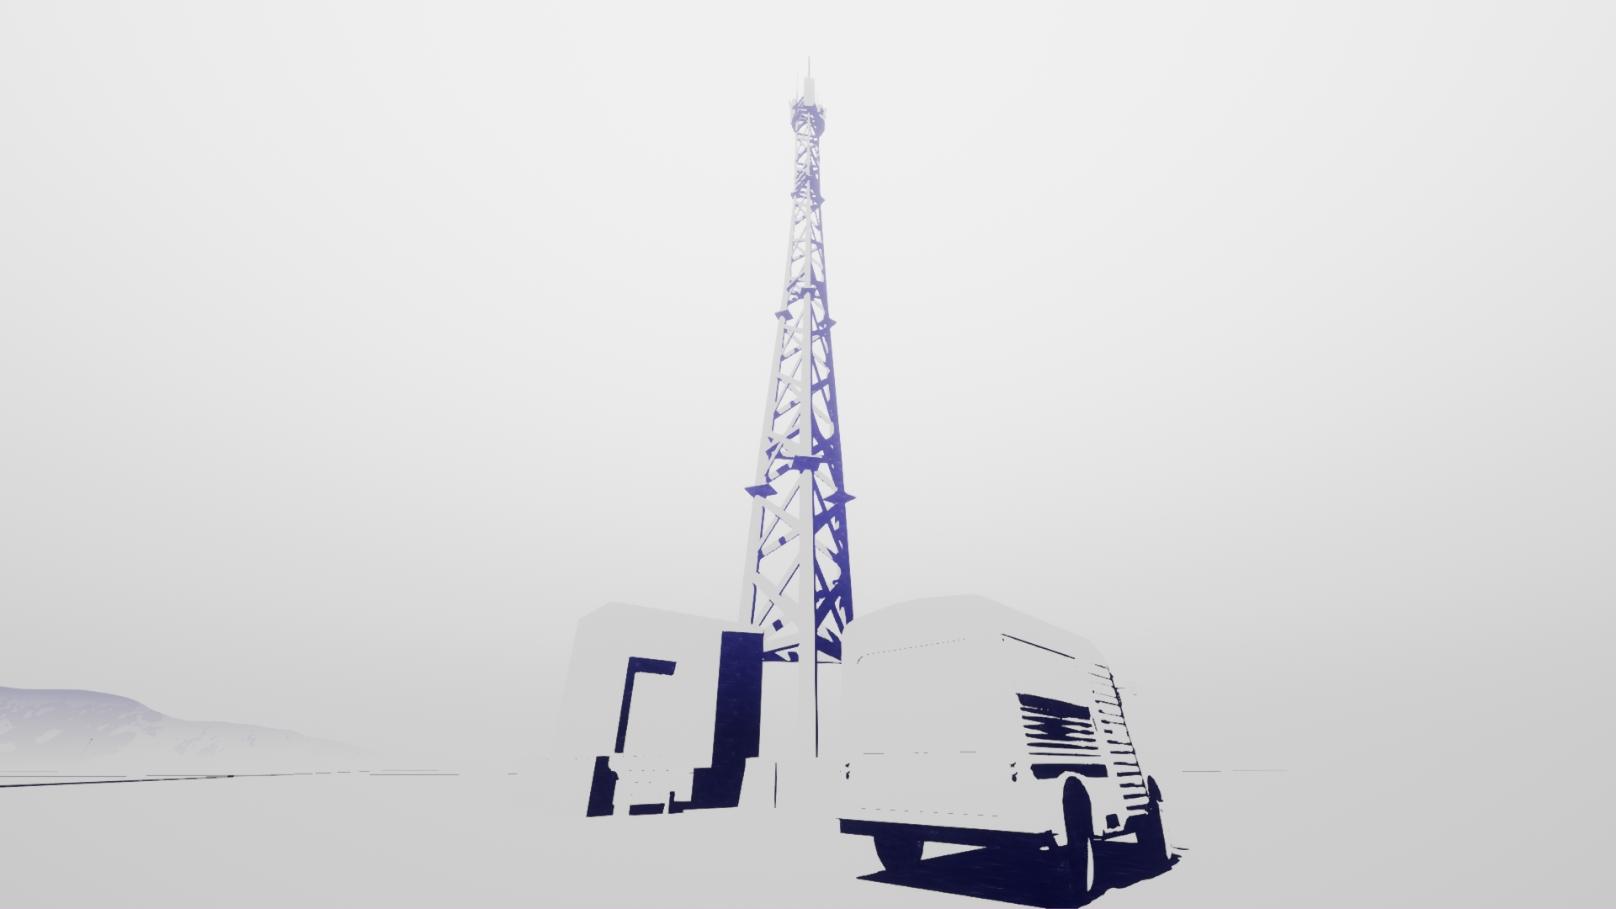 Tower and van tests